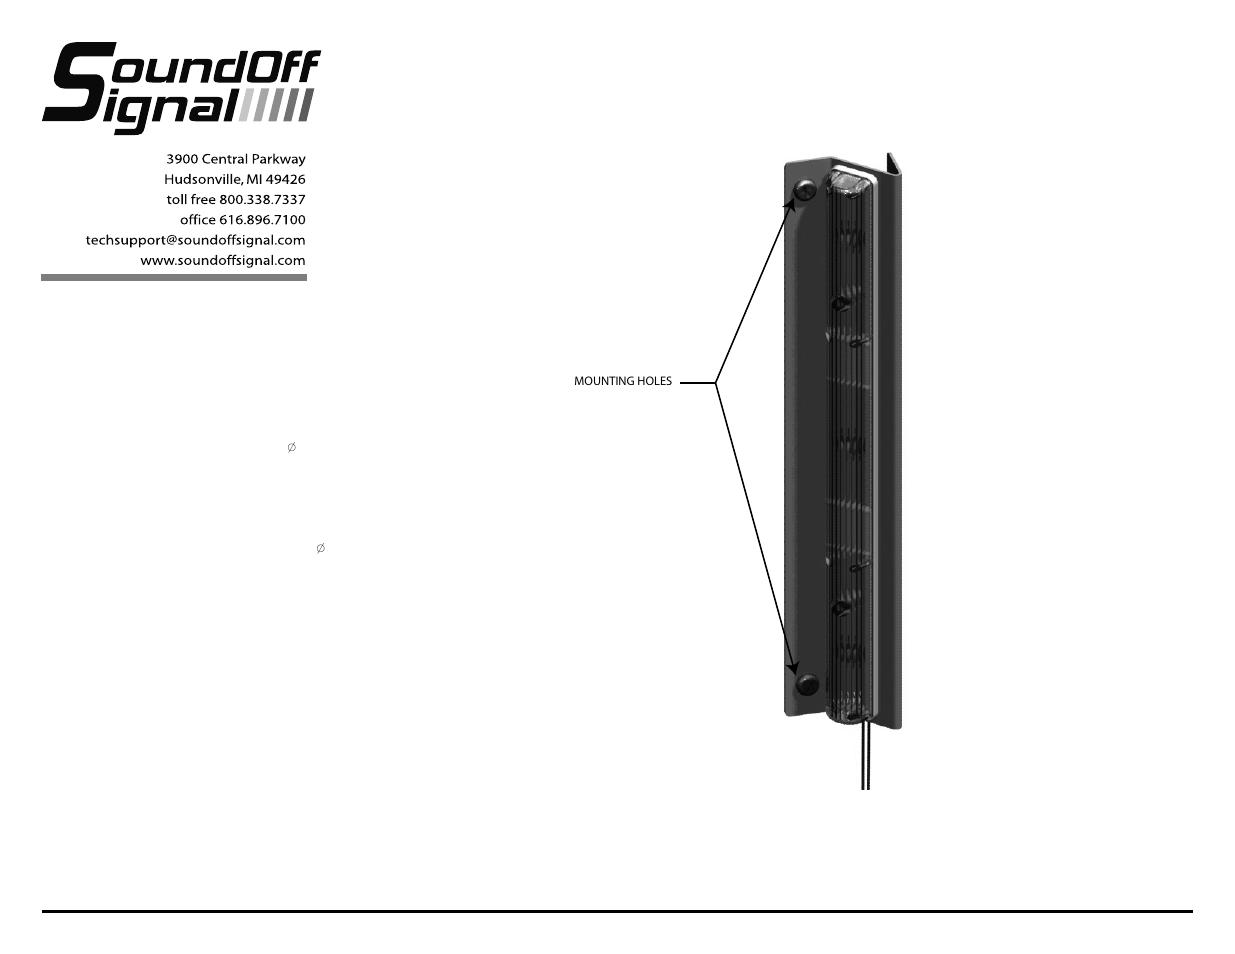 Soundoff Signal Etsa380mf Wiring Diagram